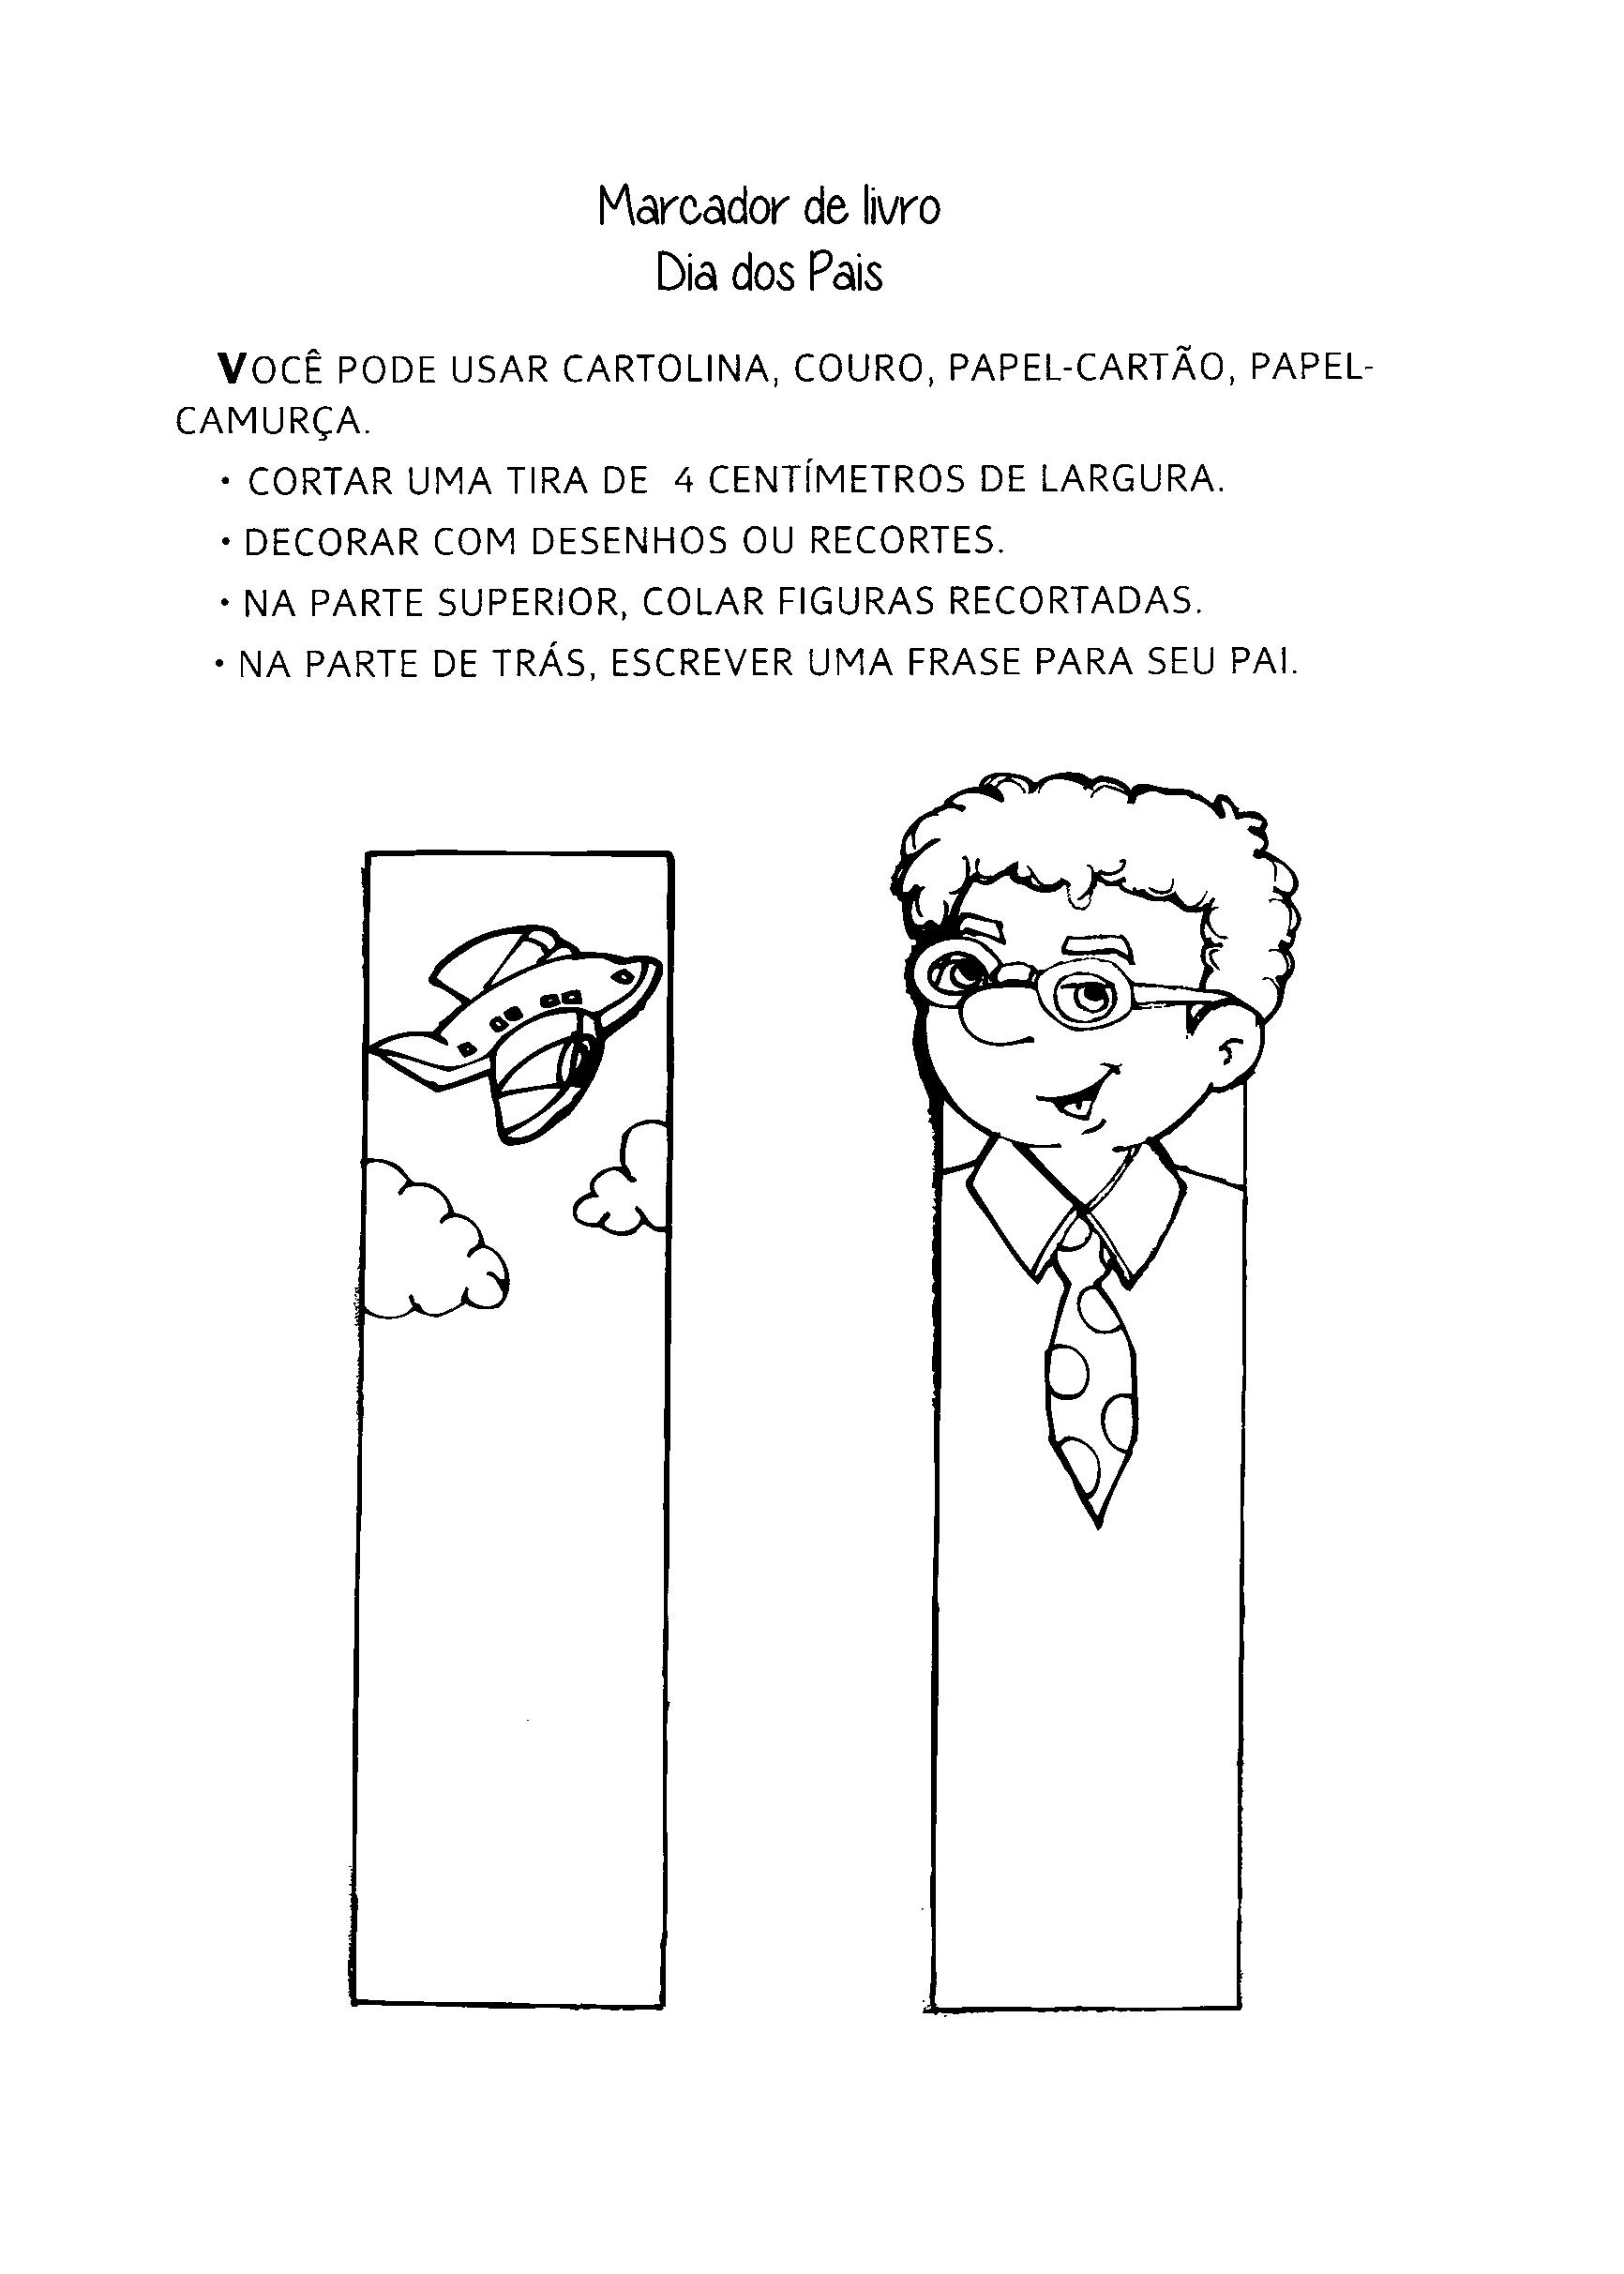 0216-dia-pais-marcador-pagina